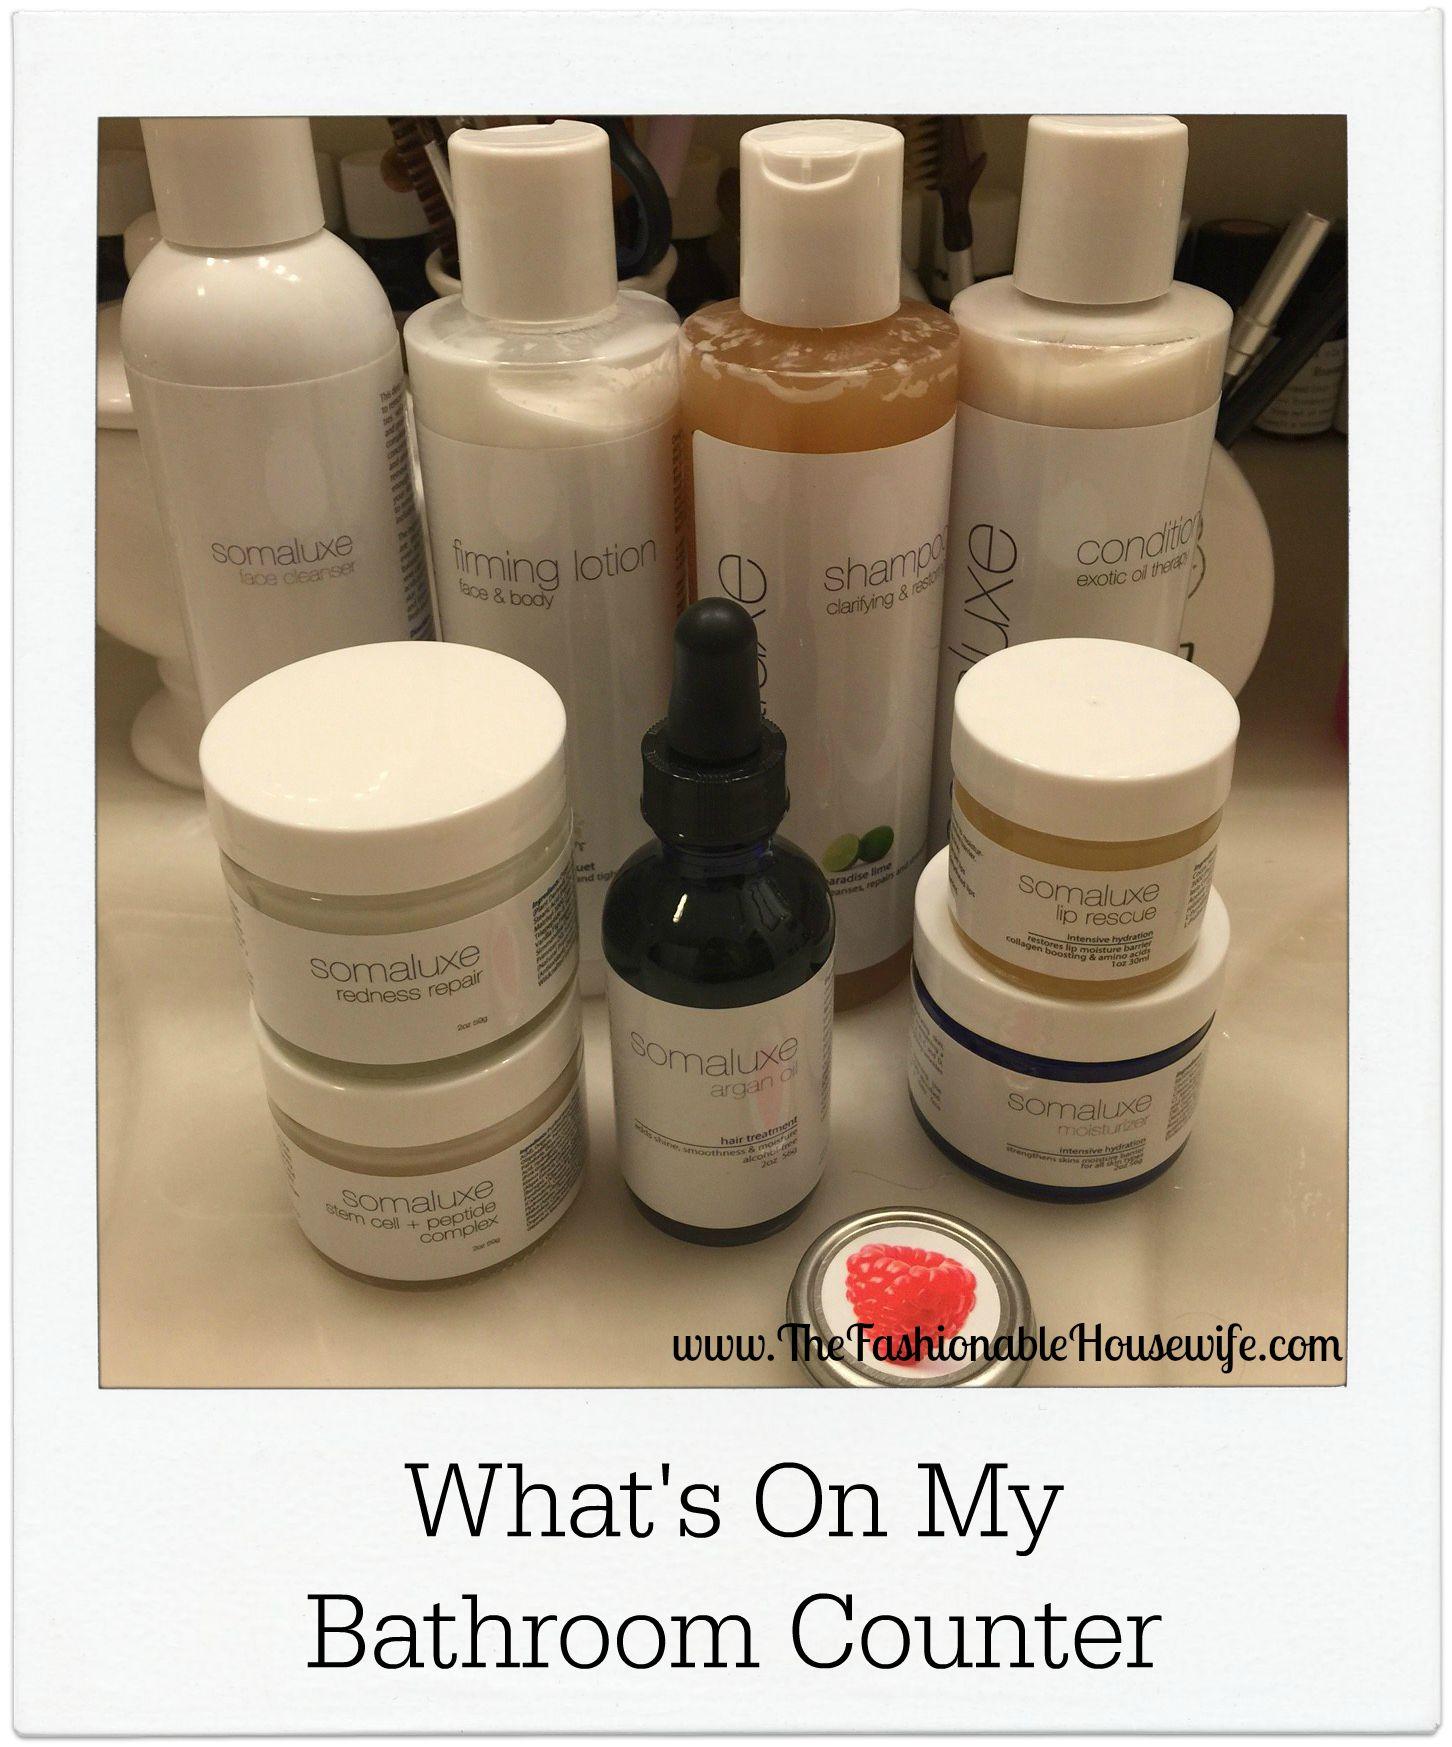 somaluxe productss